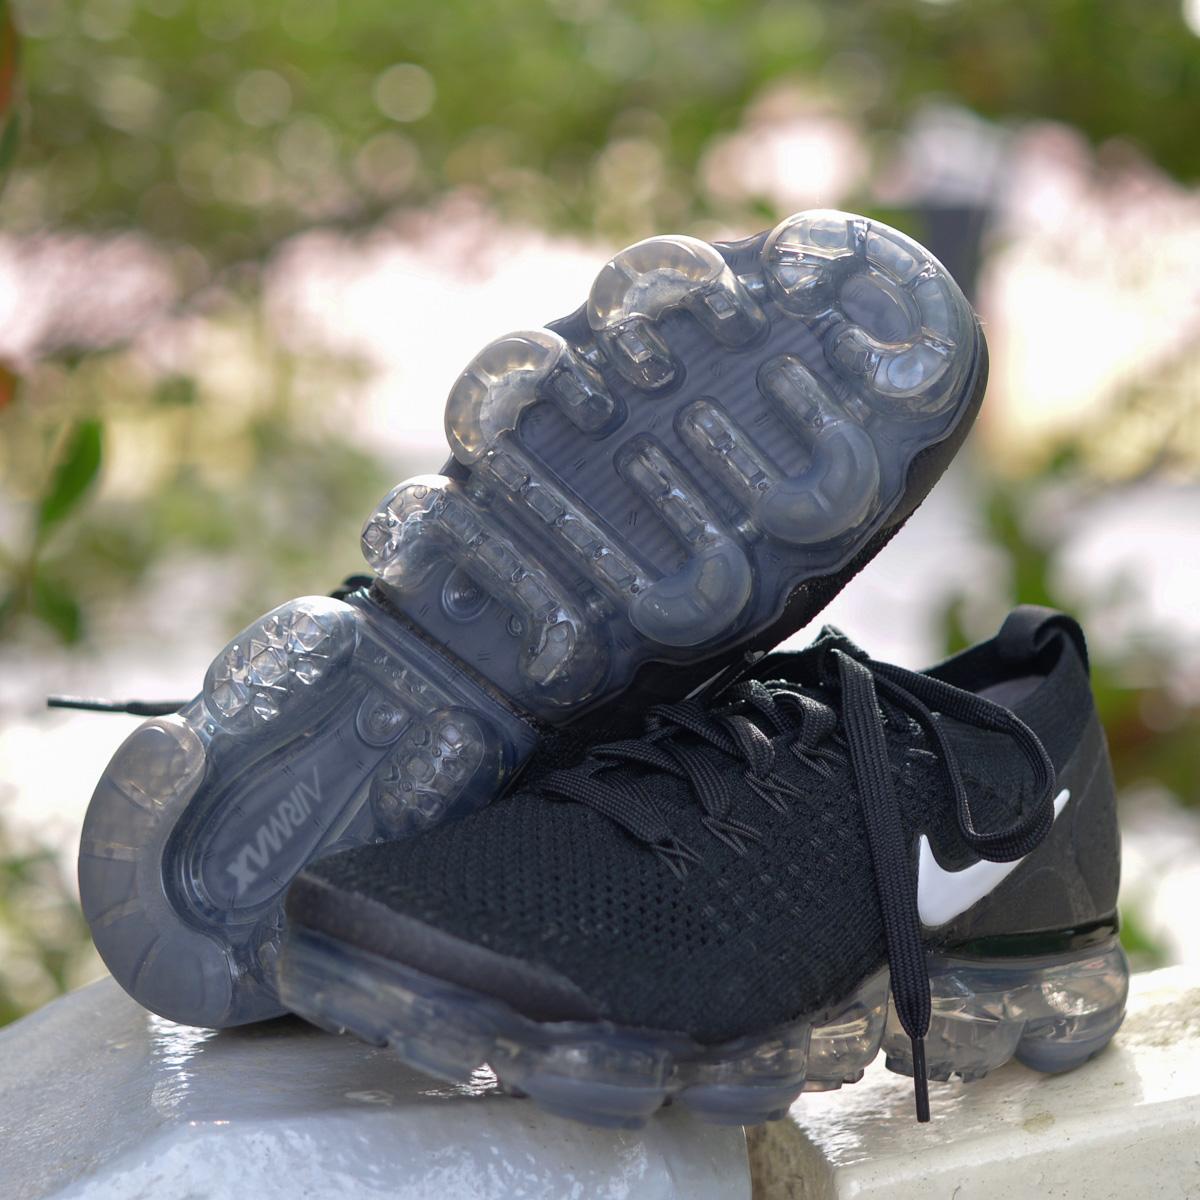 NIKE W AIR VAPORMAX FLYKNIT 2 (Nike women air vapor max fried food knit 2)  BLACK/WHITE-DARK GREY-METALLIC SILVER 18SP-I